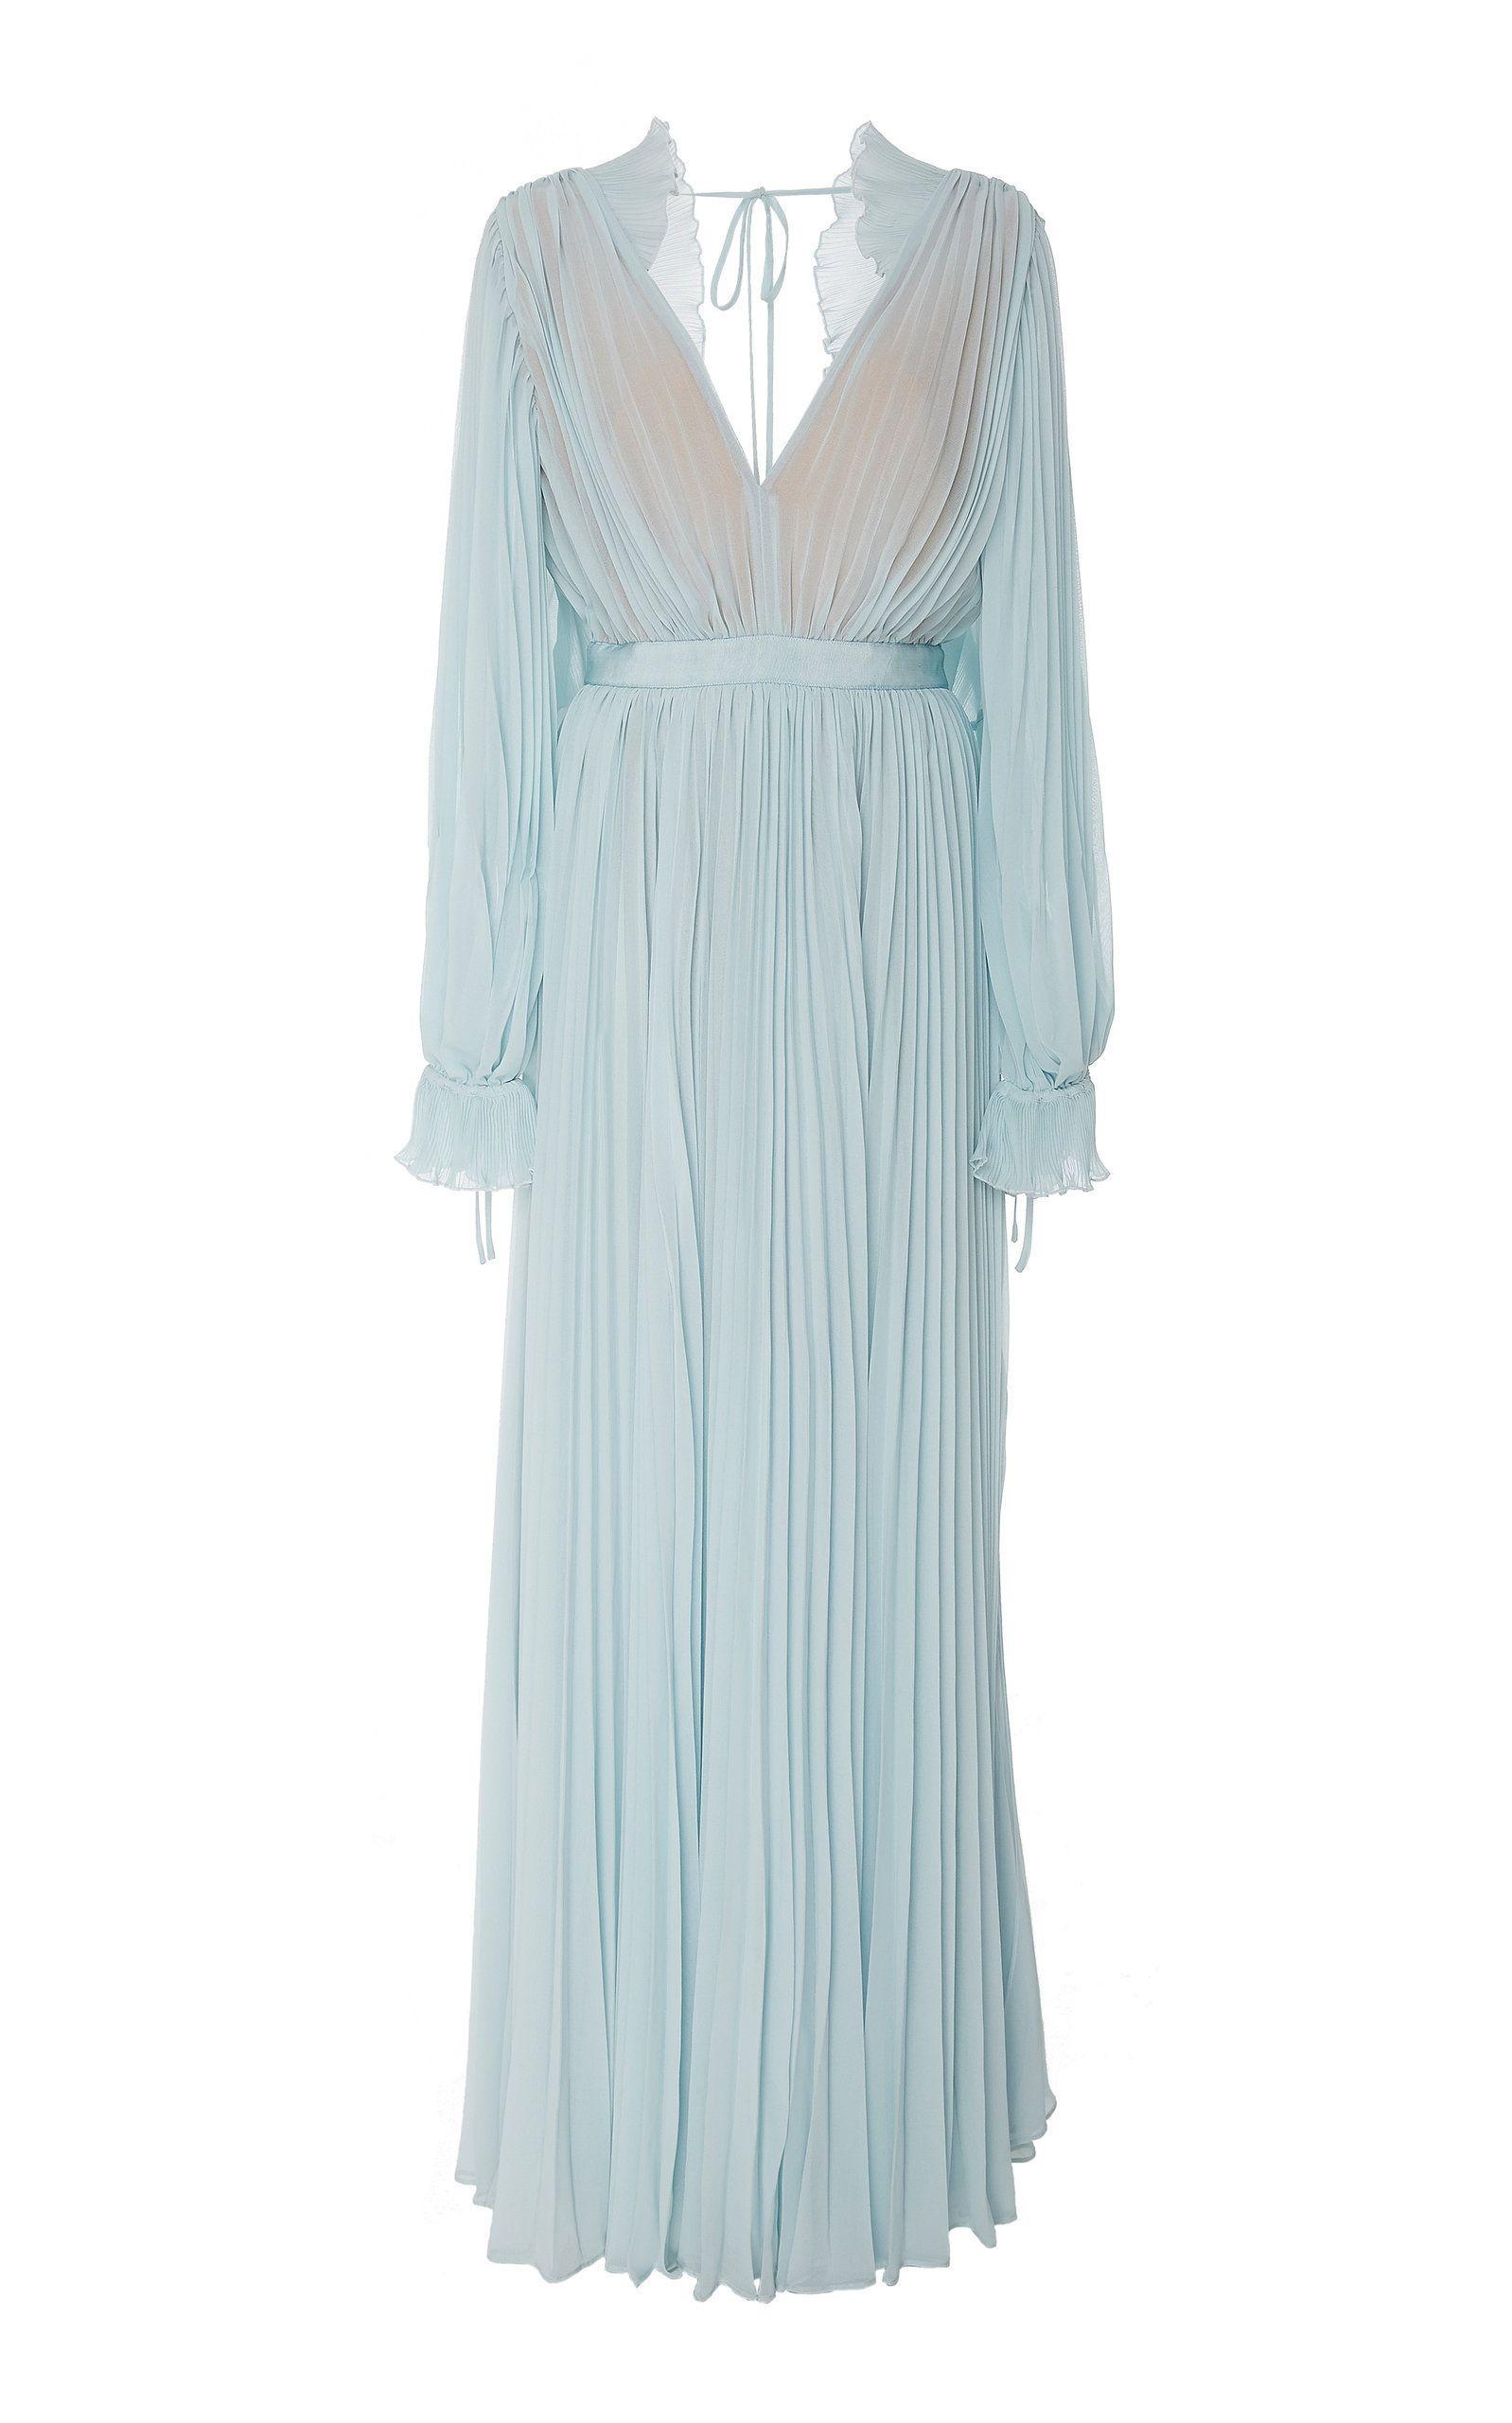 9b4ec04cb9 Pleated Chiffon Maxi Dress by SELF PORTRAIT Now Available on Moda Operandi